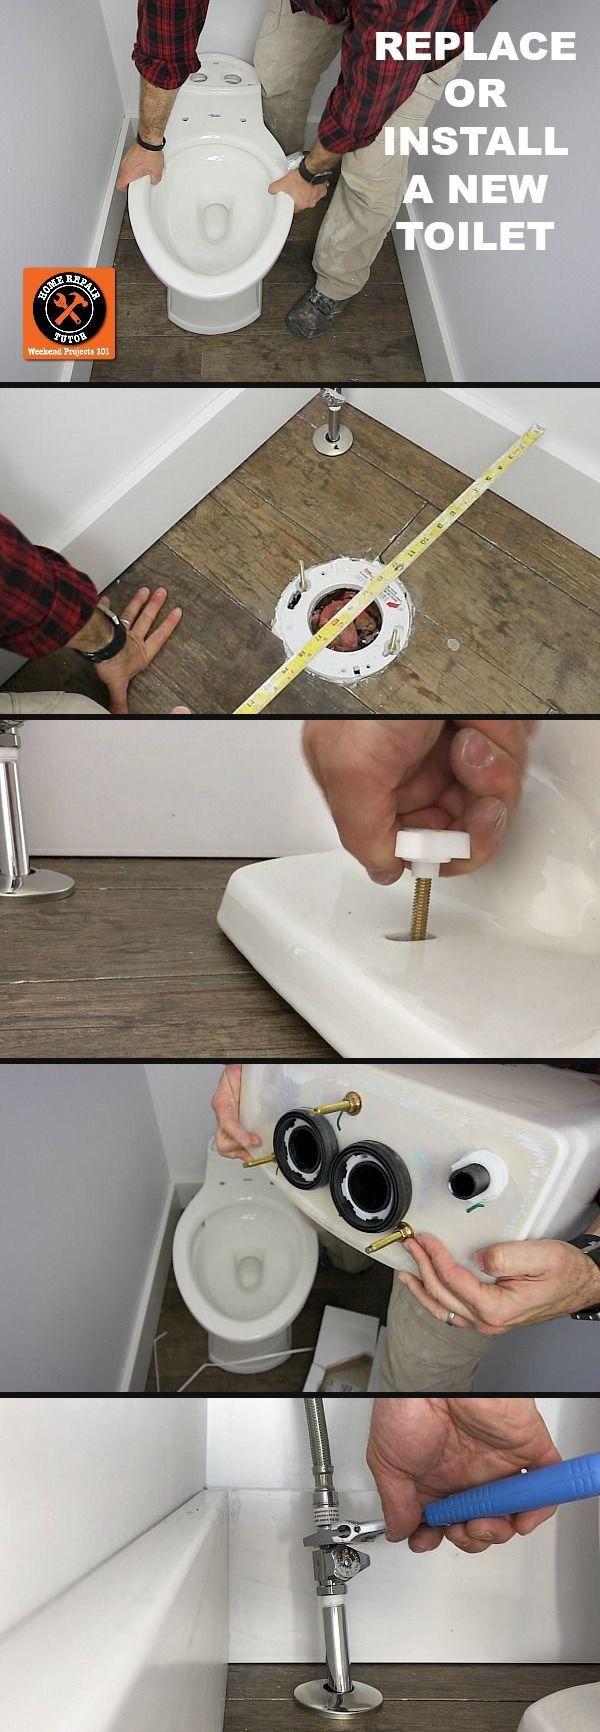 C mo reemplazar un inodoro paso a paso construccion for Construccion de un vivero paso a paso